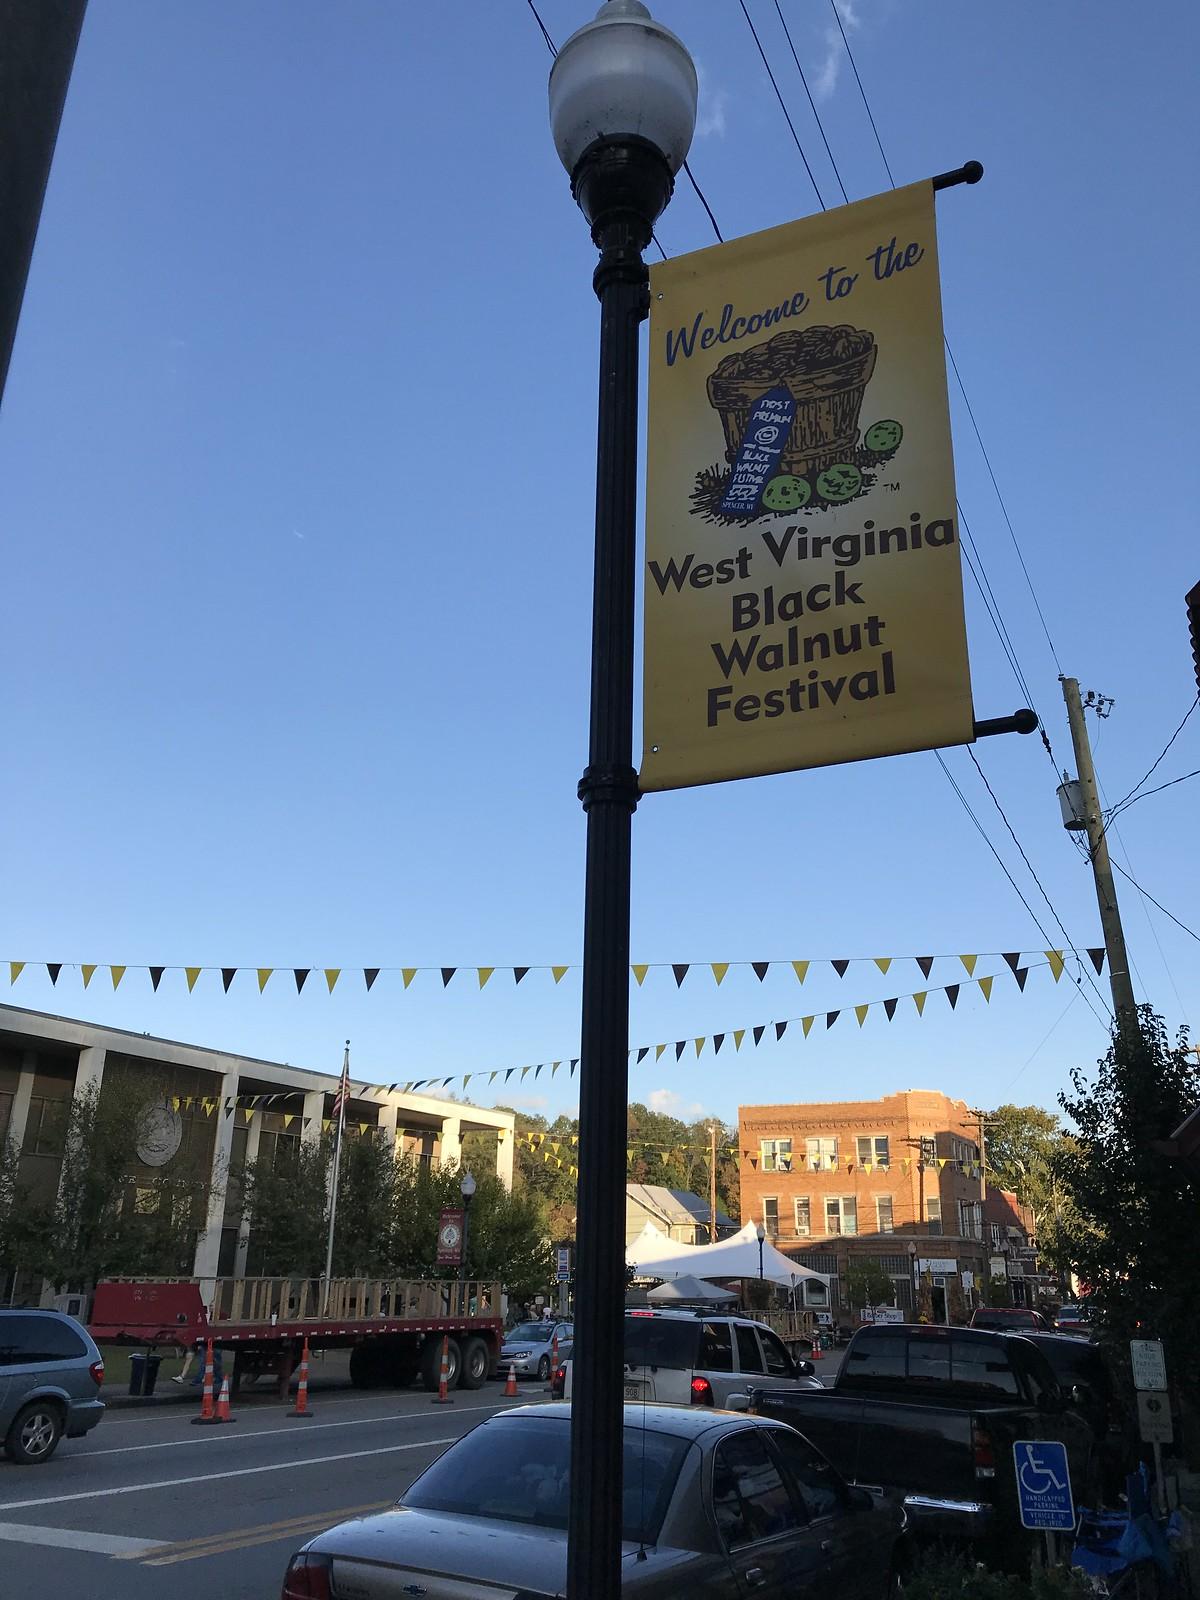 Black Walnut Festival